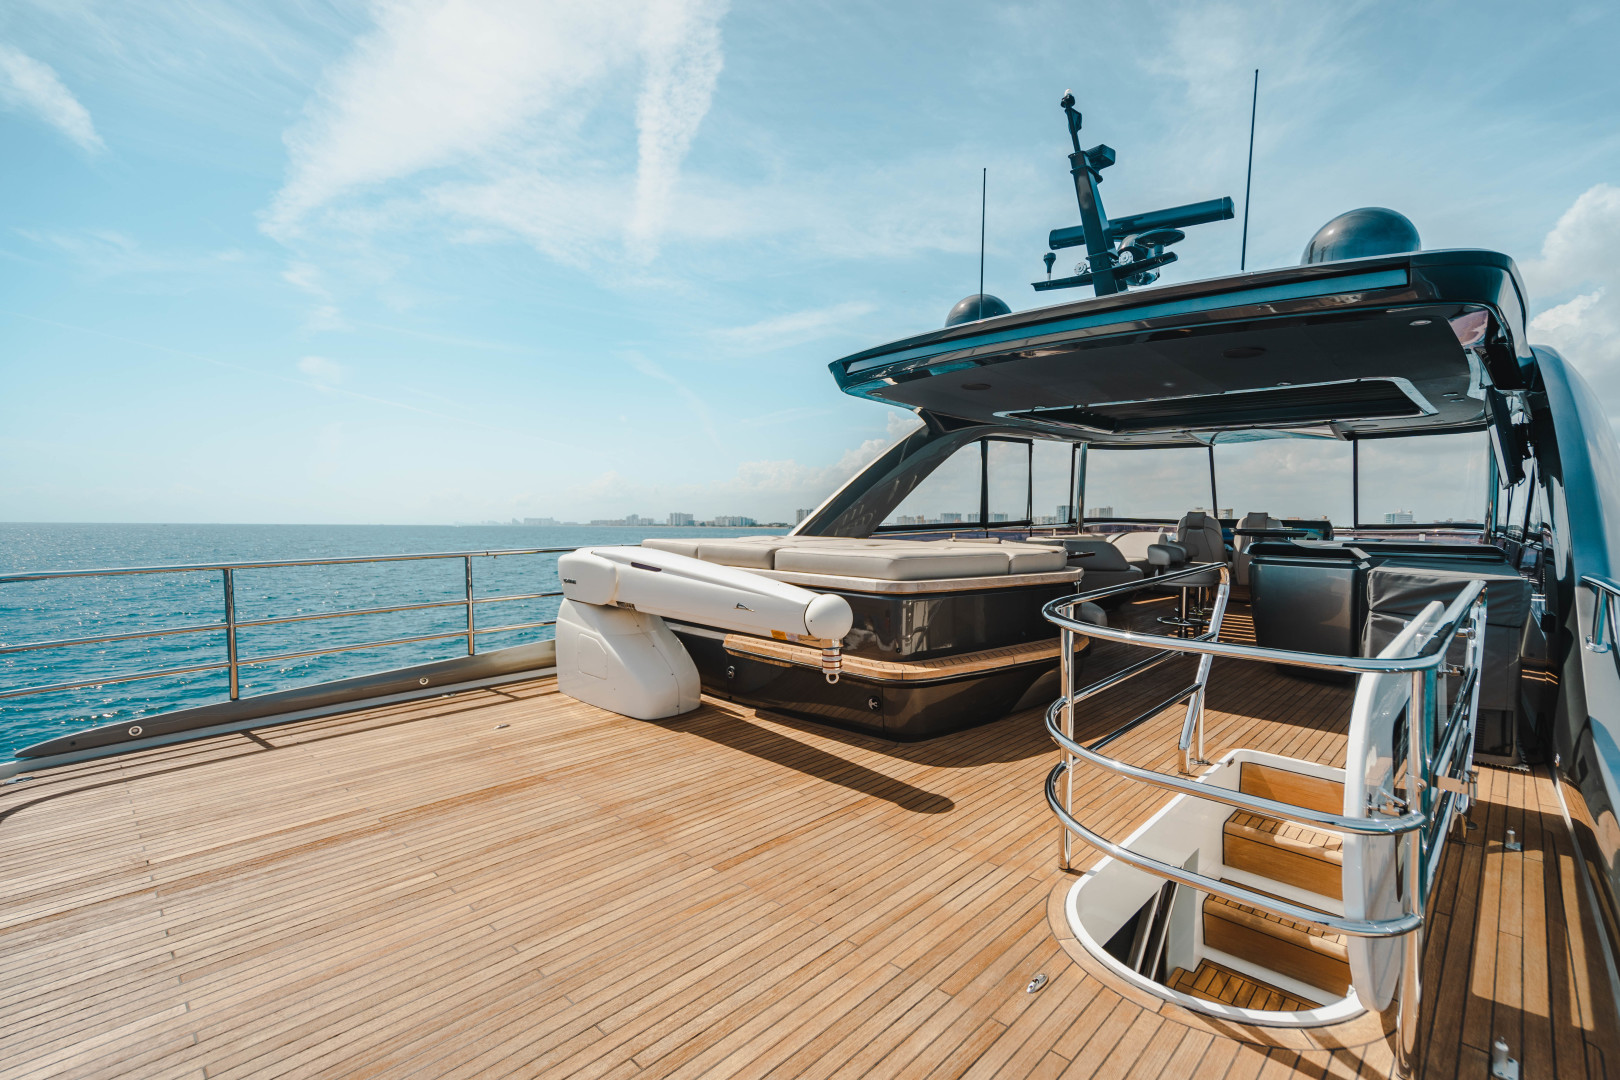 Princess-Y85  2019-Splash Delray Beach-Florida-United States-1631626 | Thumbnail